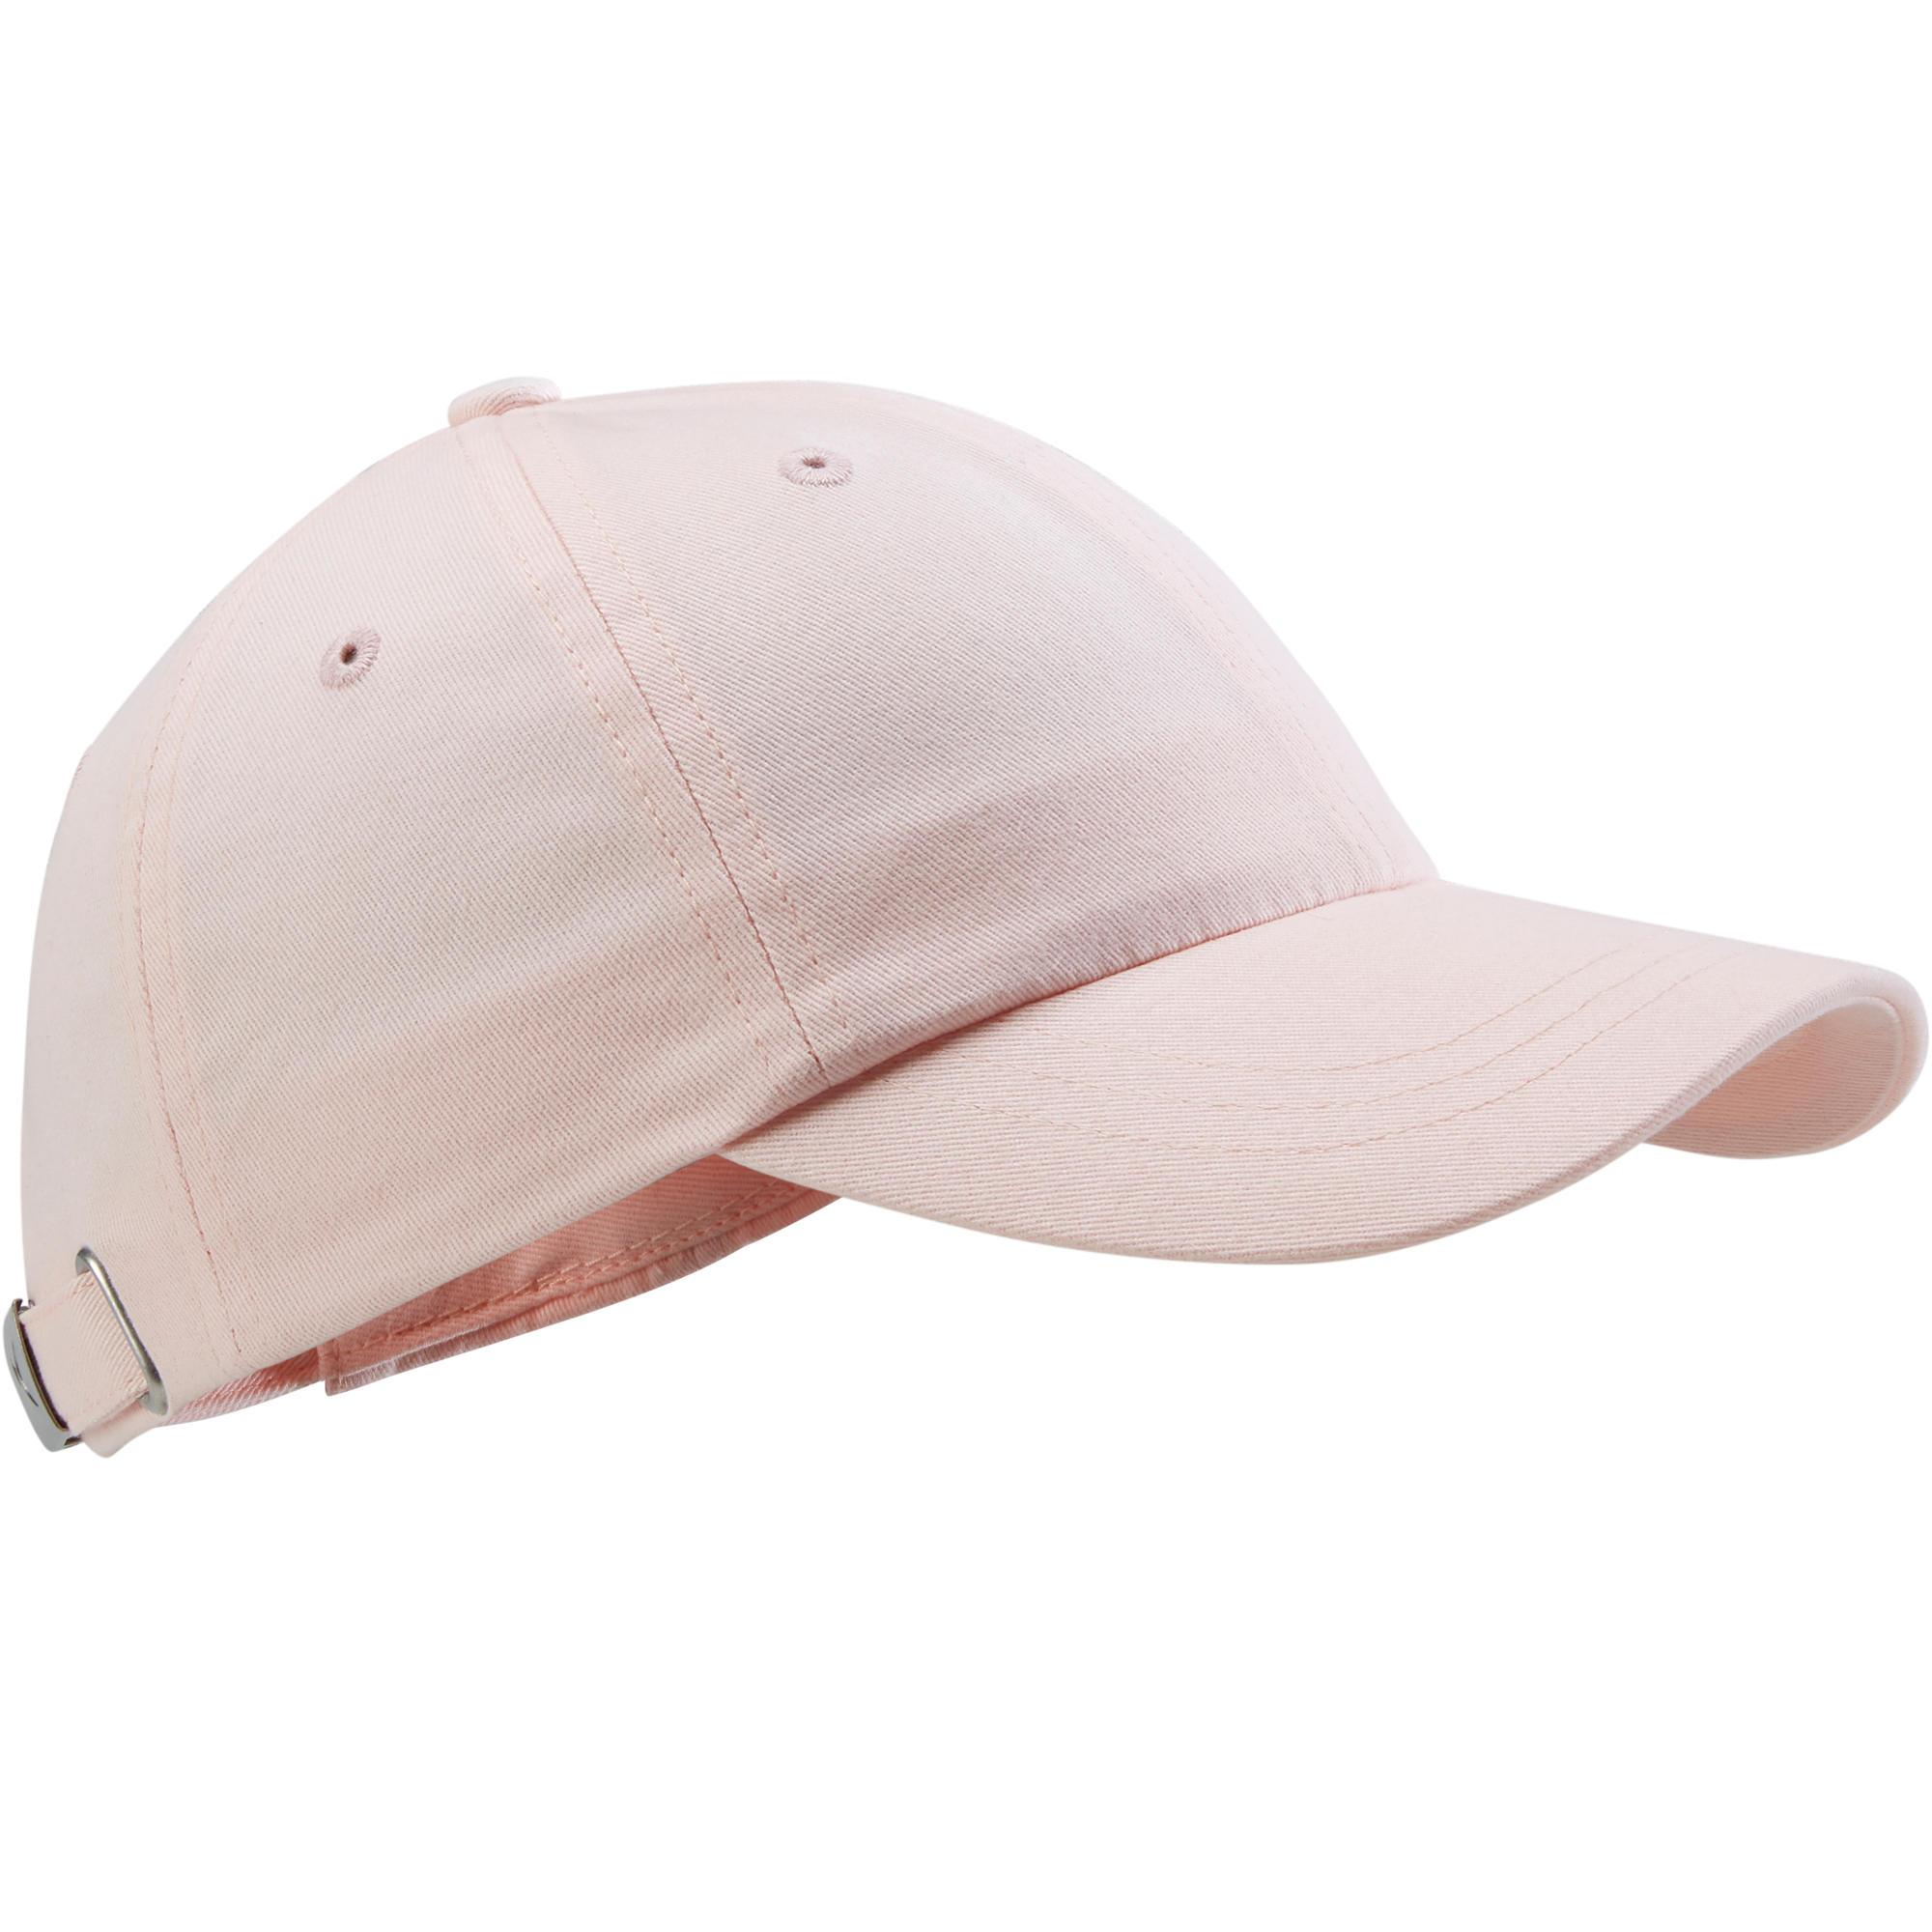 Șapcă W100 roz fete la Reducere poza